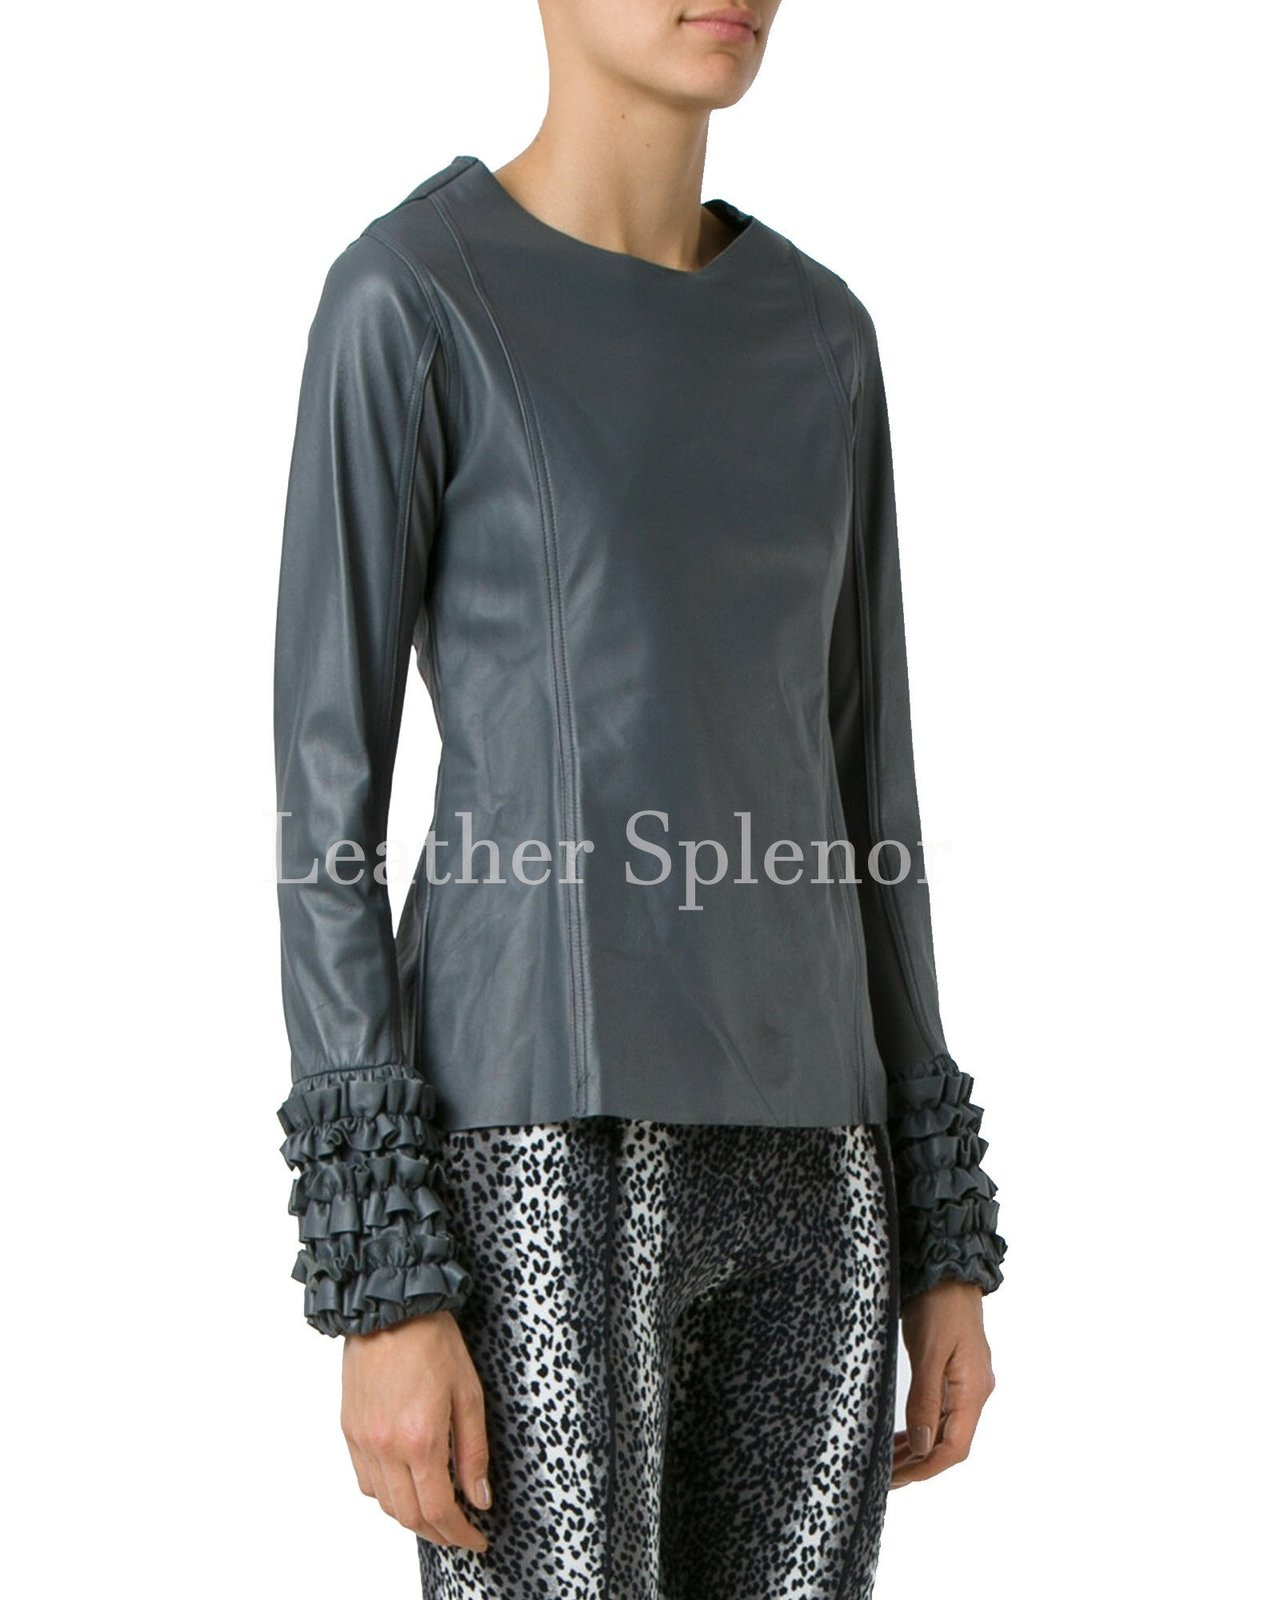 Ruffle Sleeves Hem Women Leather Top